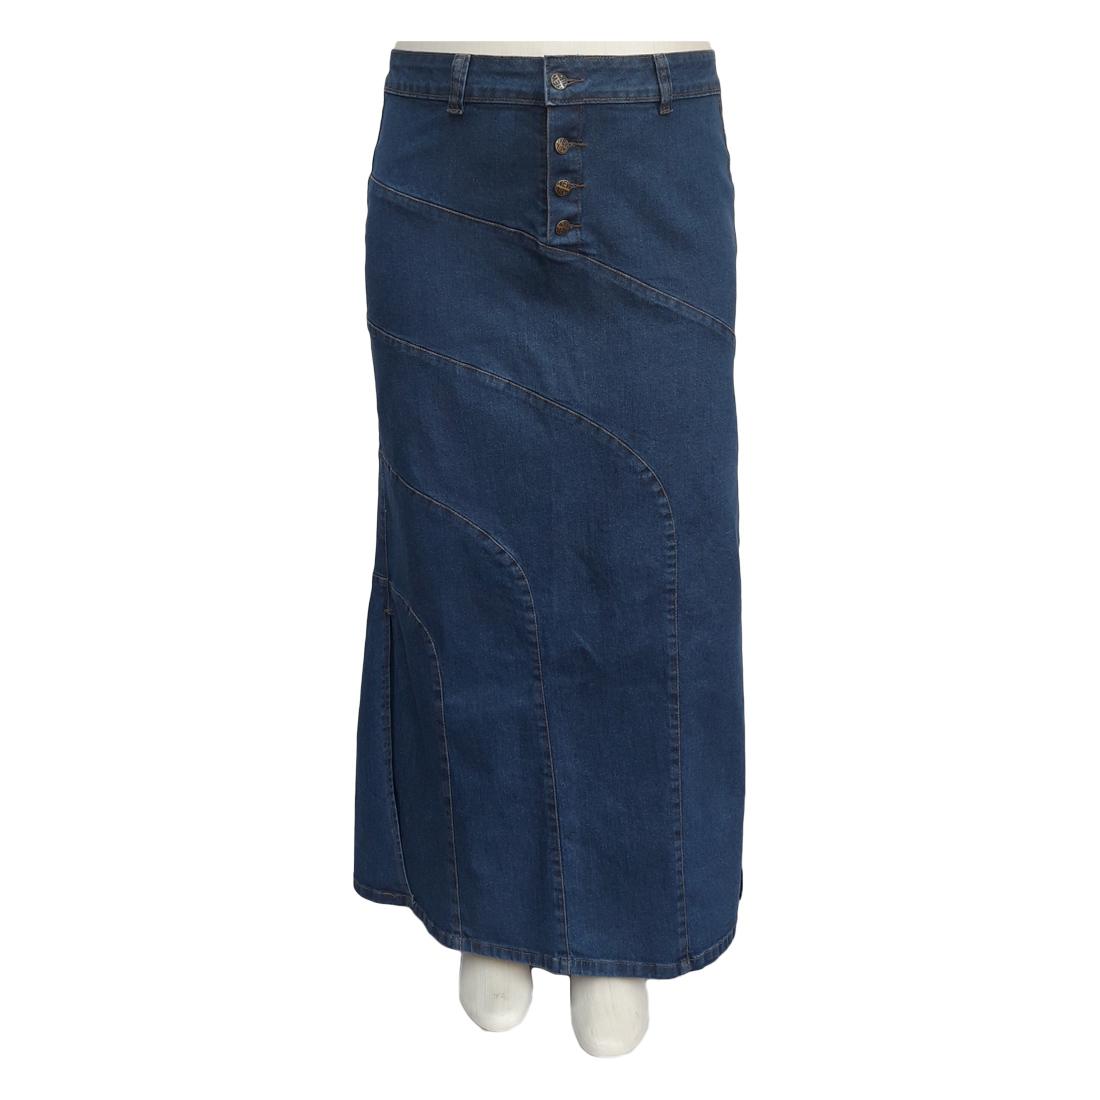 Saia Jeans Longa Fendas Laterais Plus Size Moda Evangélica